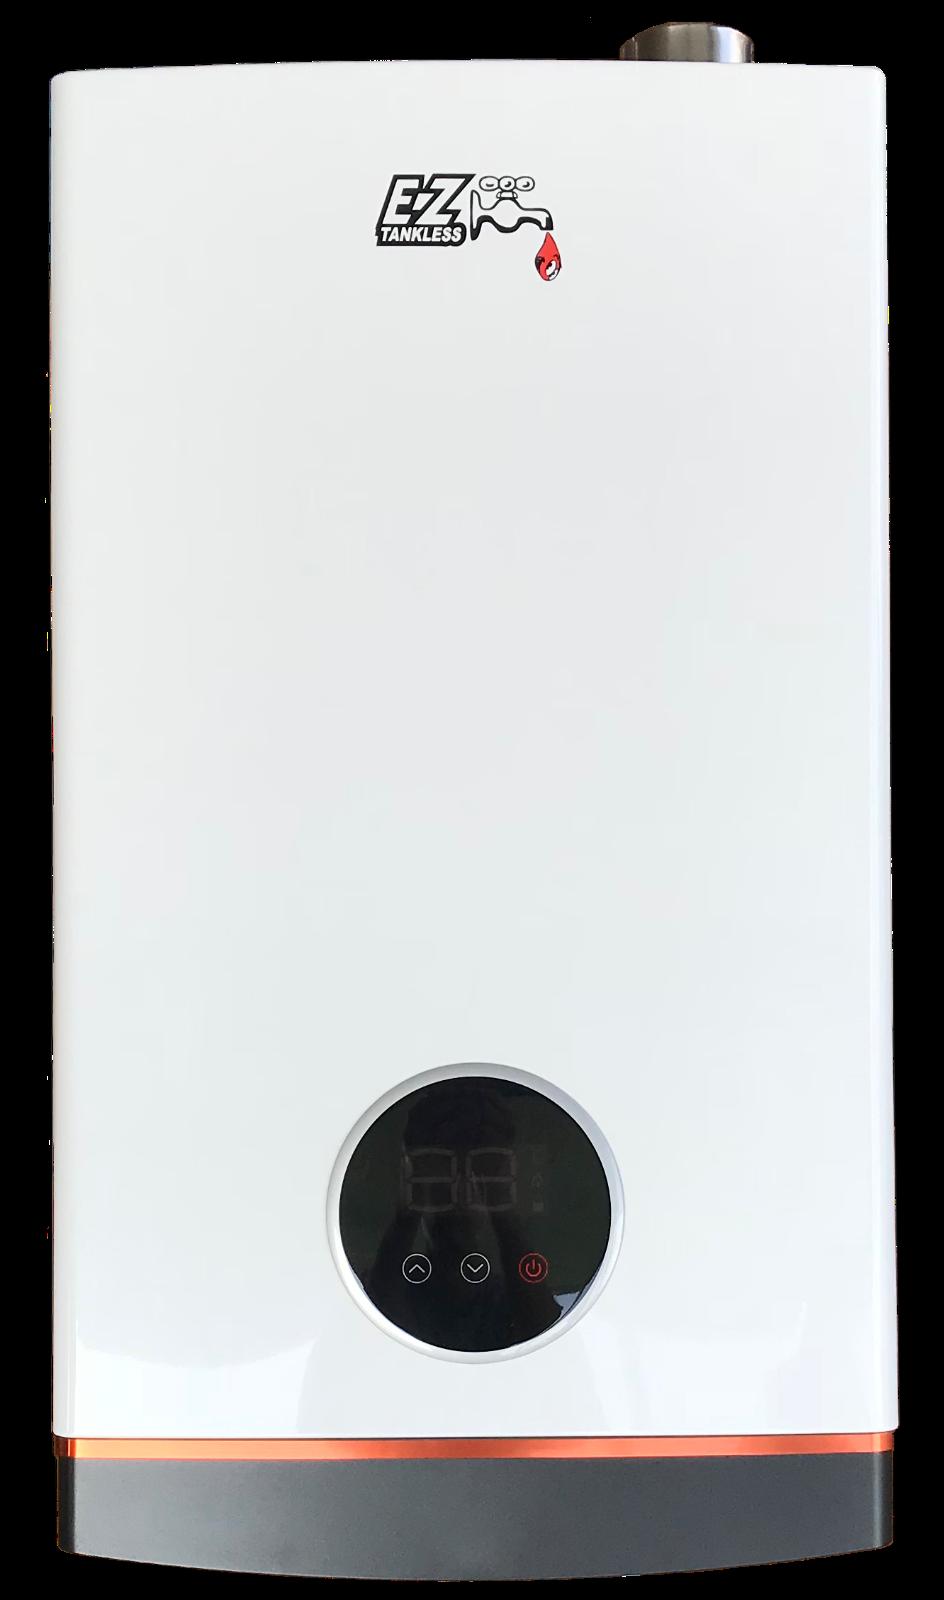 EZ Deluxe PROPANE LPG Tankless Water Heater - for 1-2 bathro